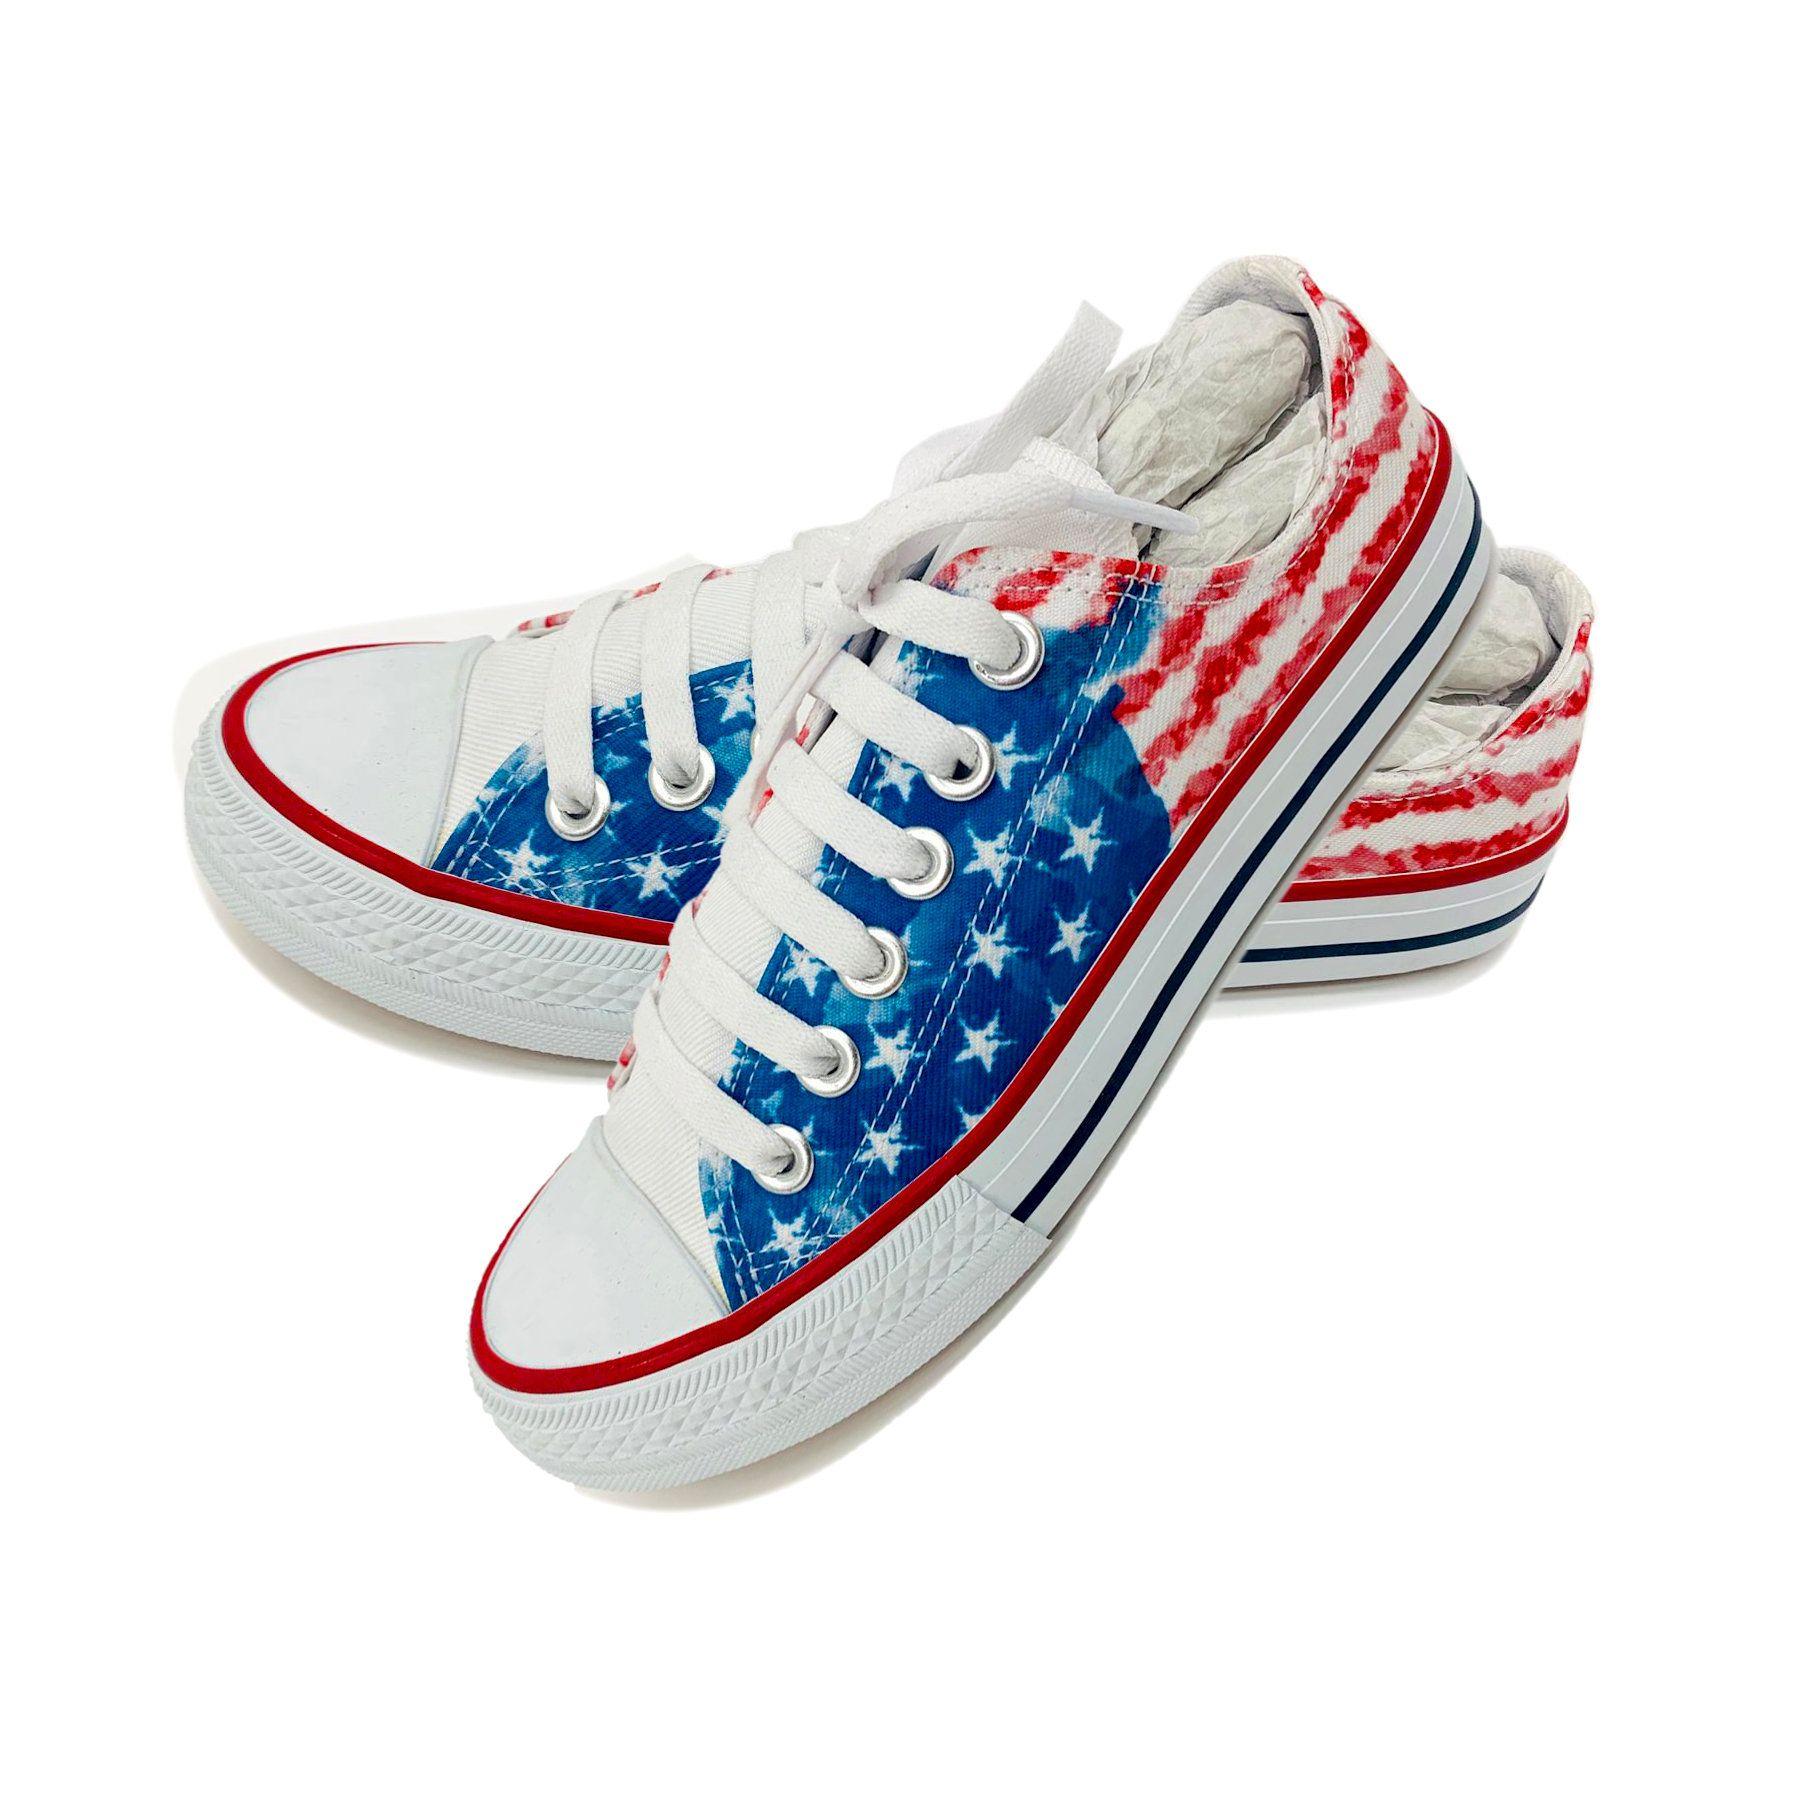 Women Tennis Usa Stars Stripes Flag Patriotic Tennis Shoes Etsy In 2020 Patriotic Sneakers Womens Sneakers Tennis Shoes